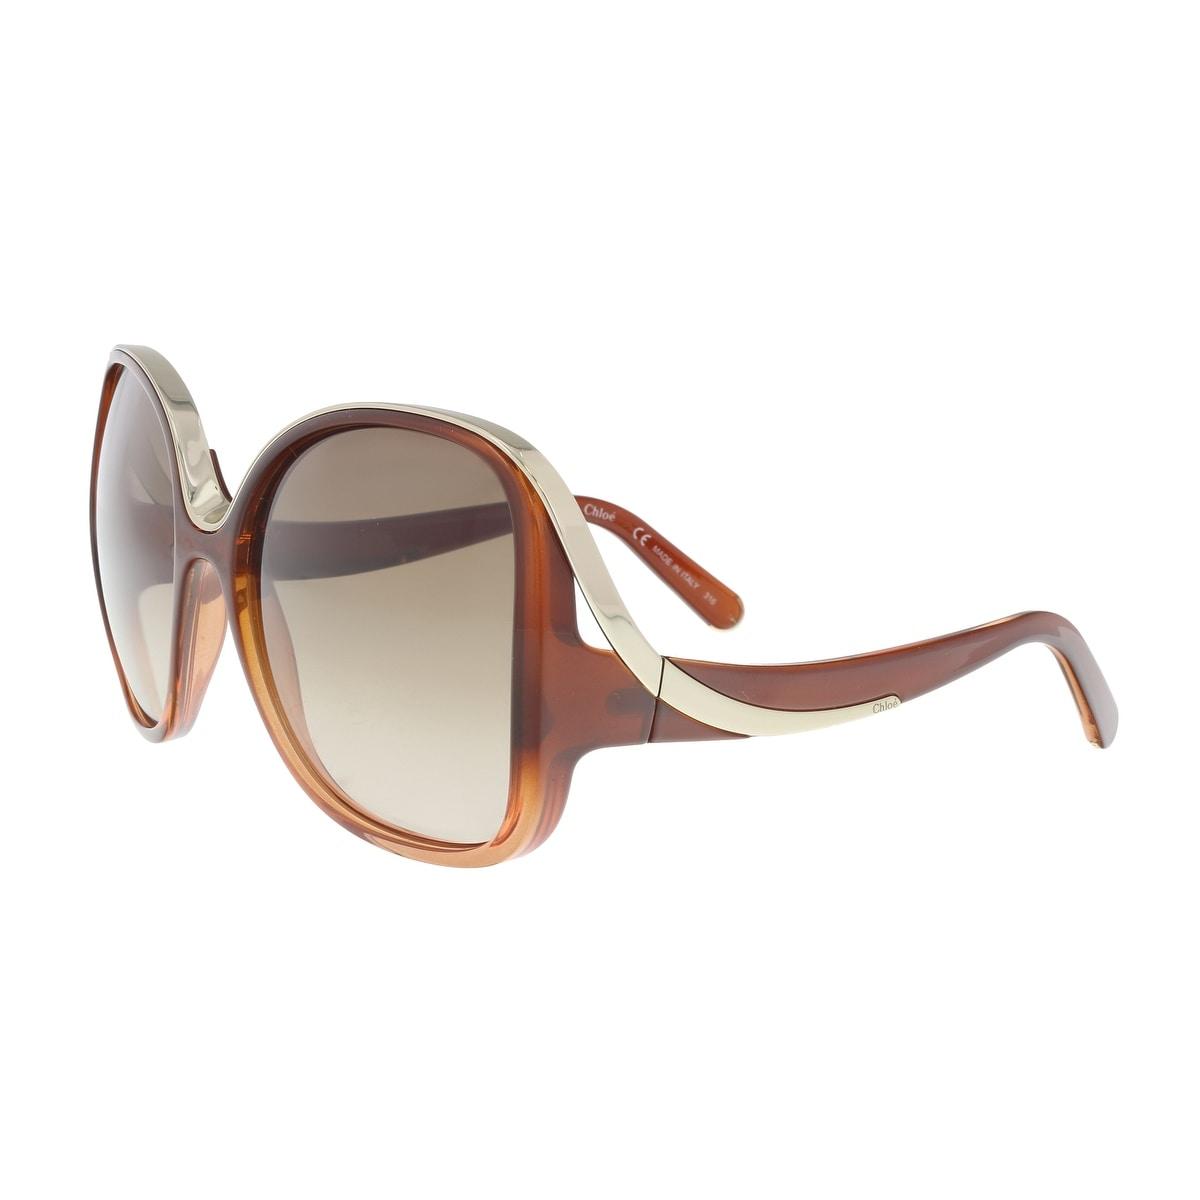 909e3db8fe69 Rectangle Women s Sunglasses